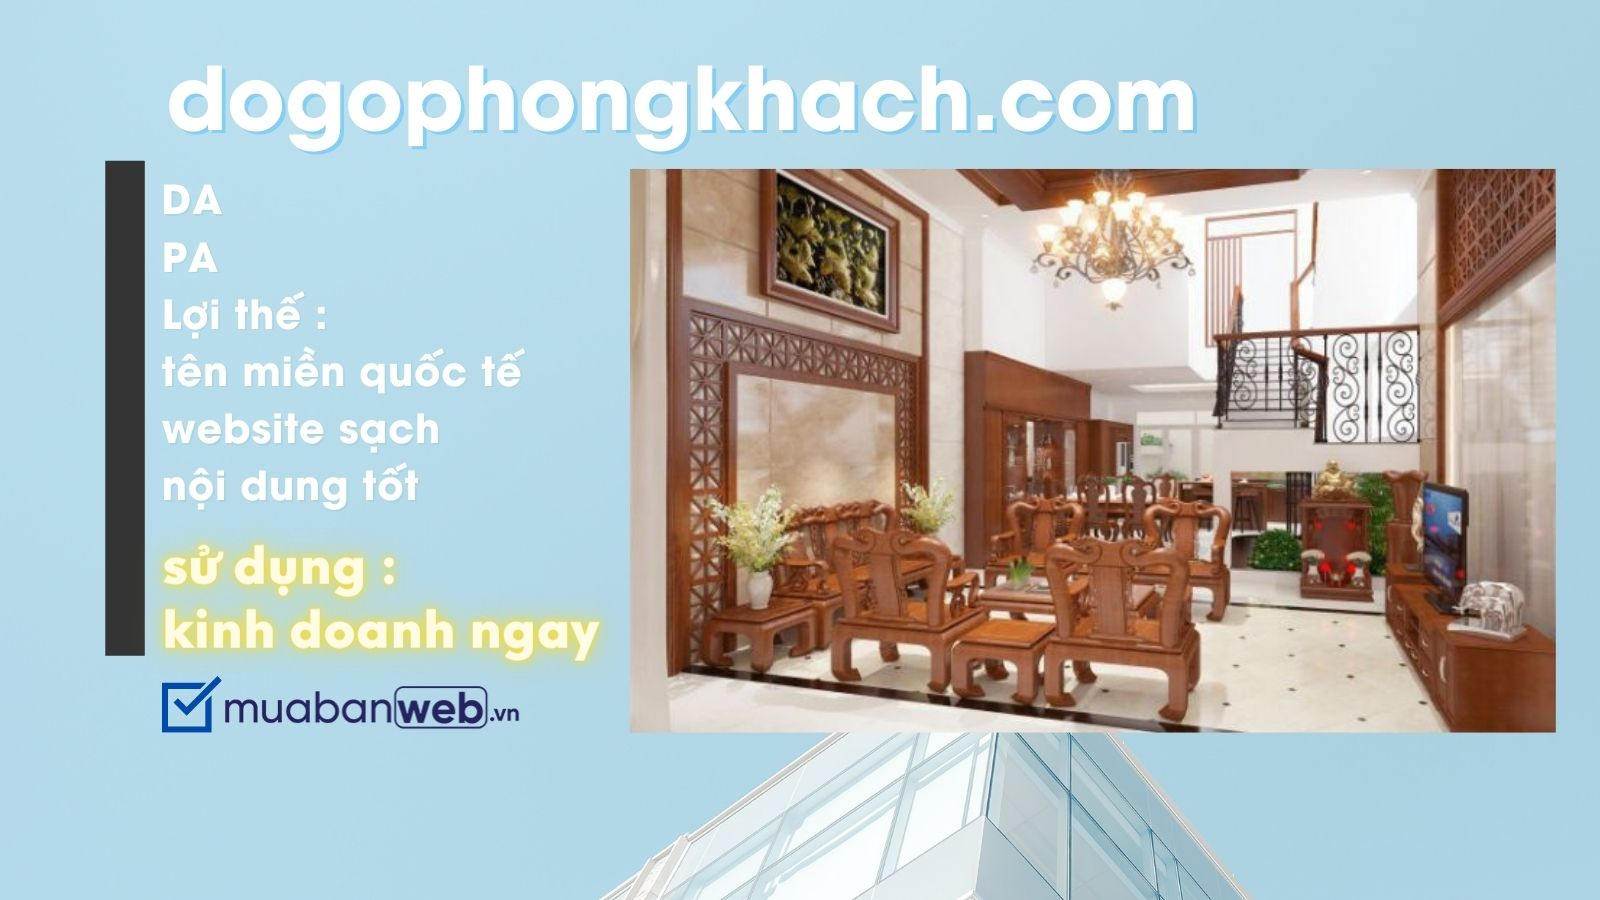 dogophongkhach.com 1